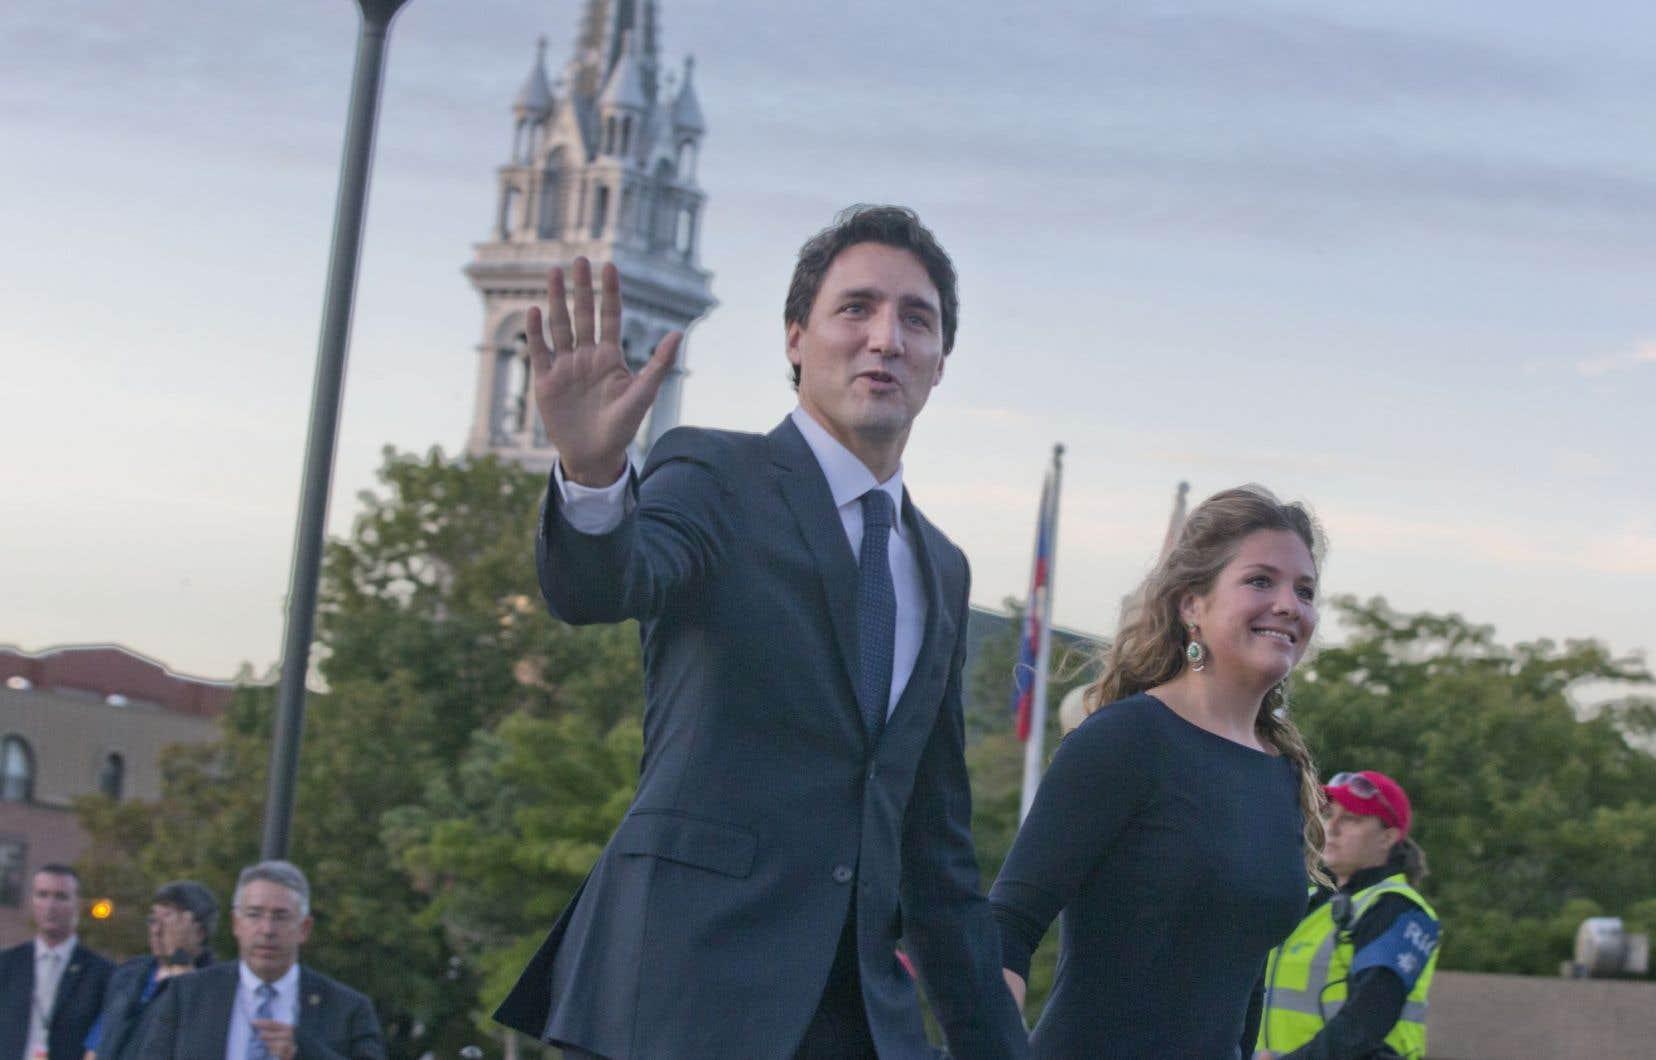 Justin Trudeau et sa compagne devant l'immeuble de Radio-Canada, jeudi soir